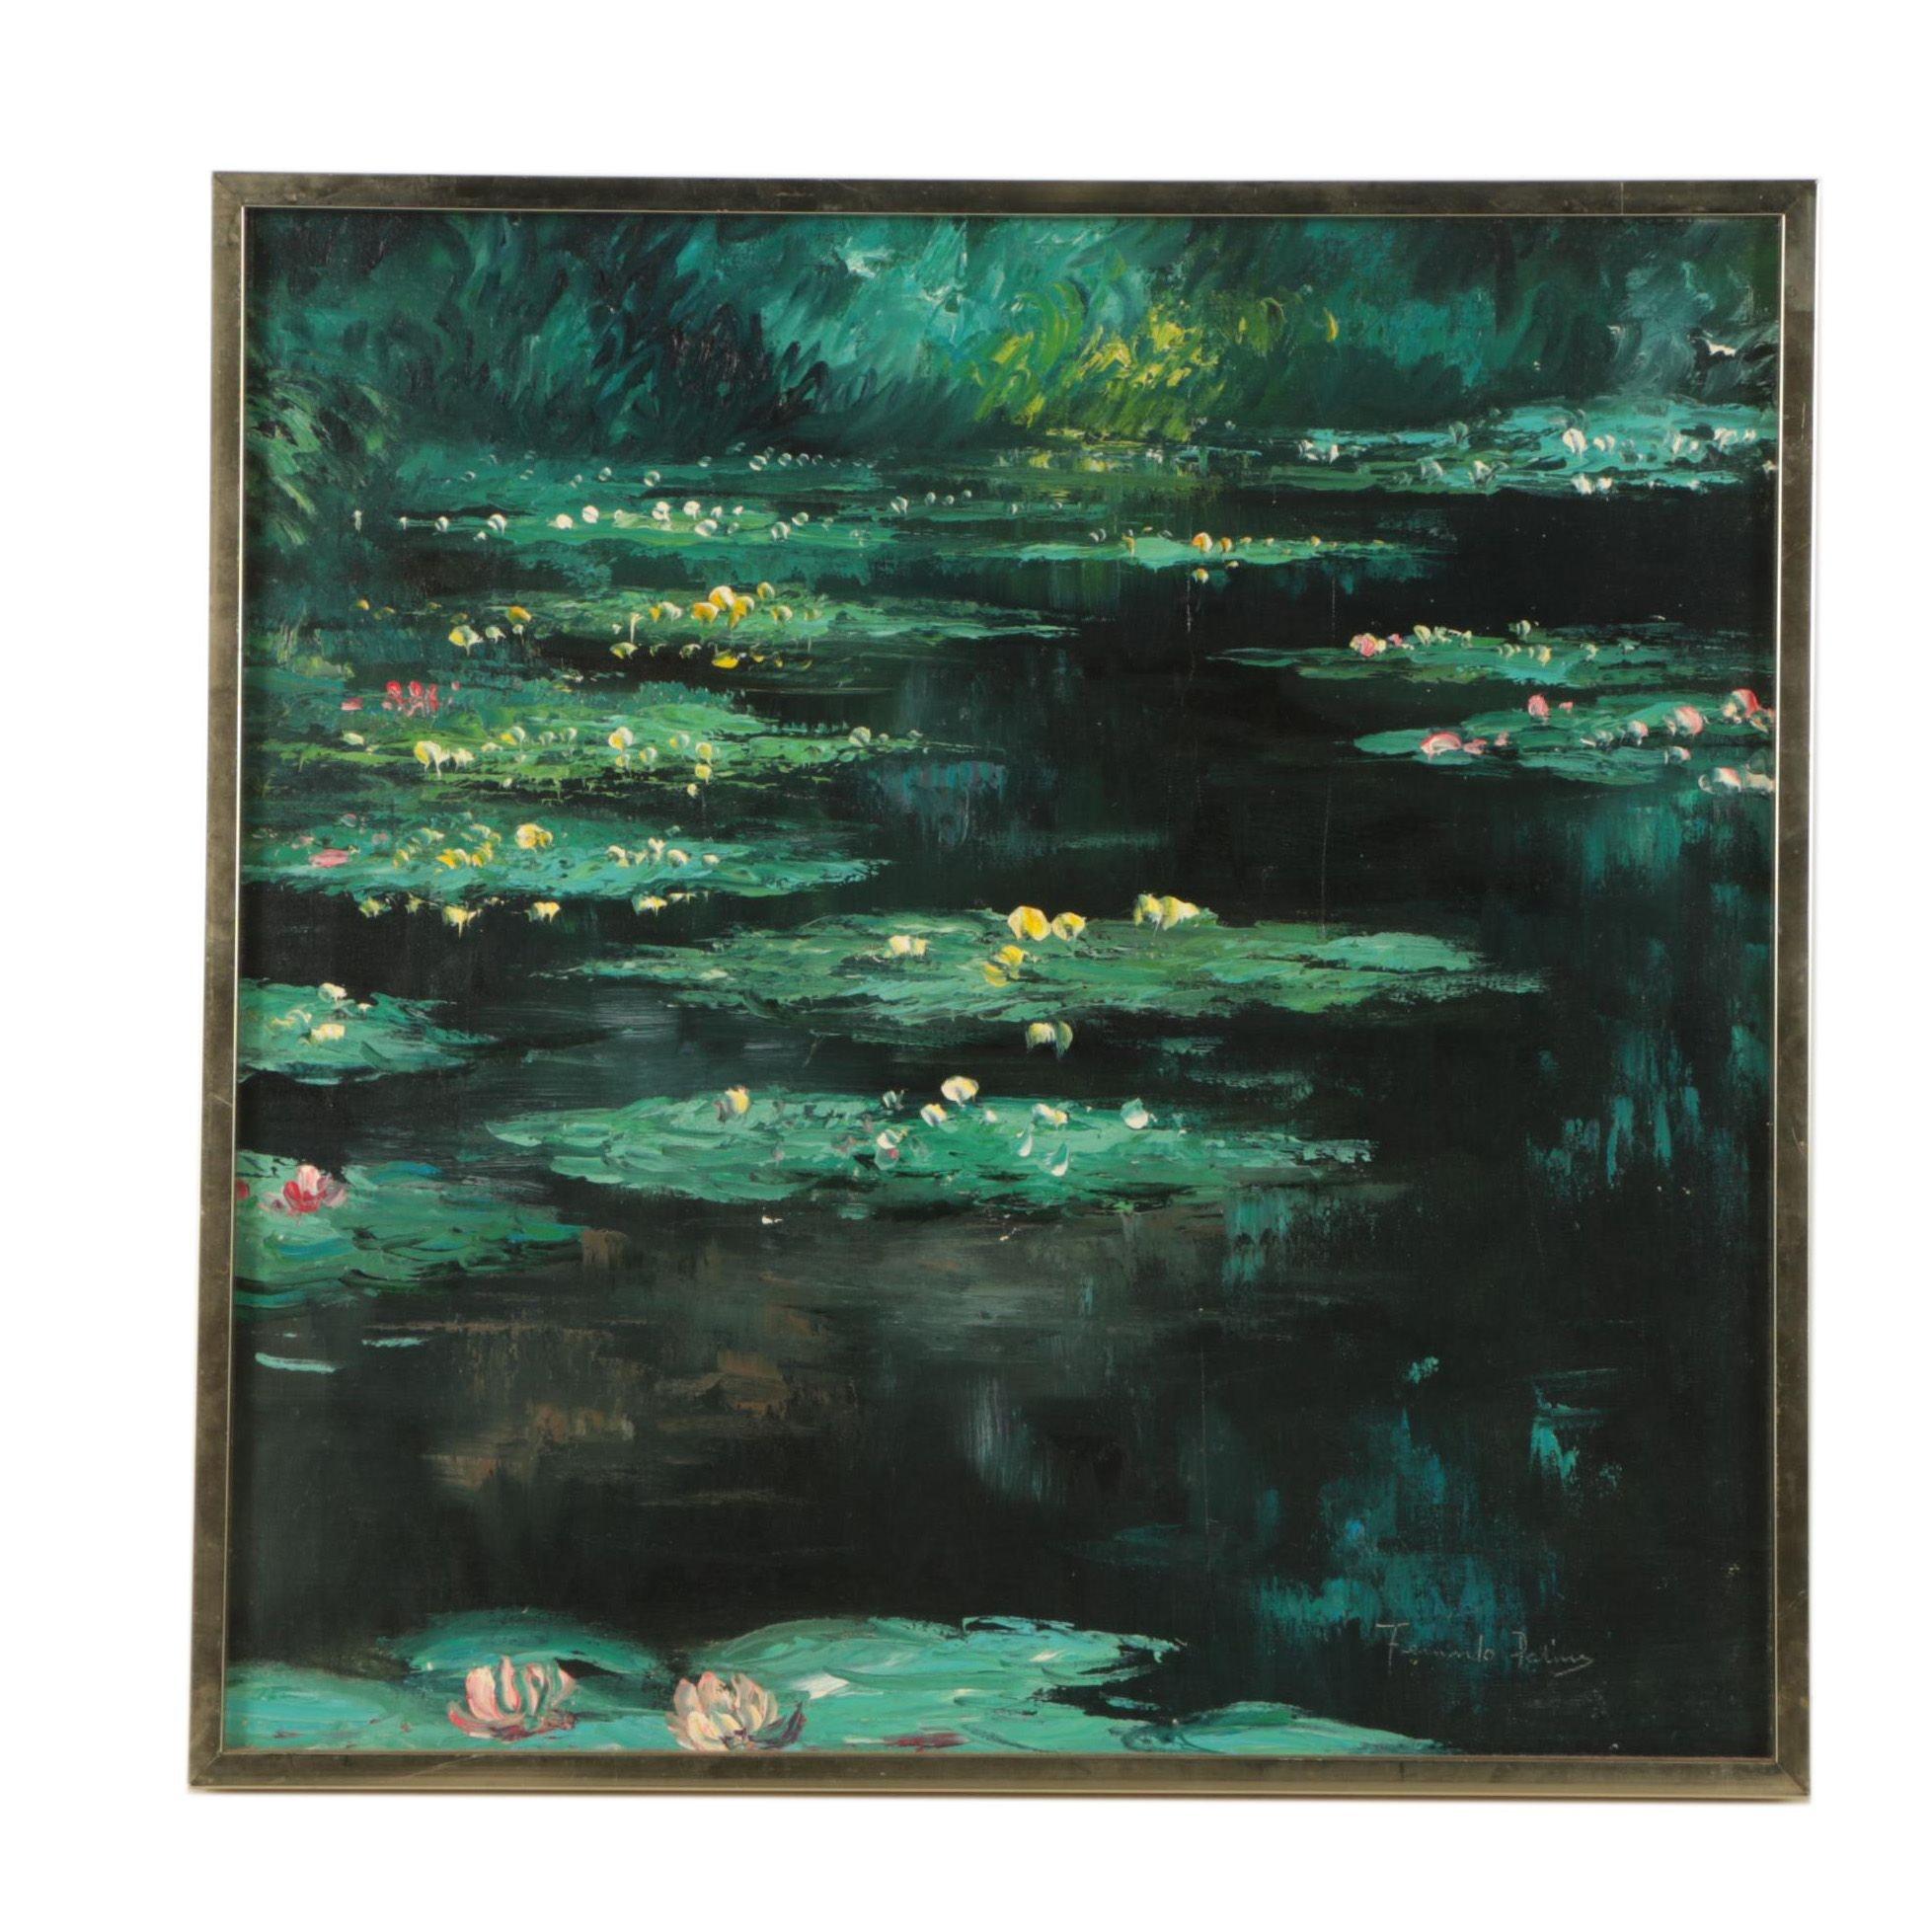 Fernando Palicio Oil Painting